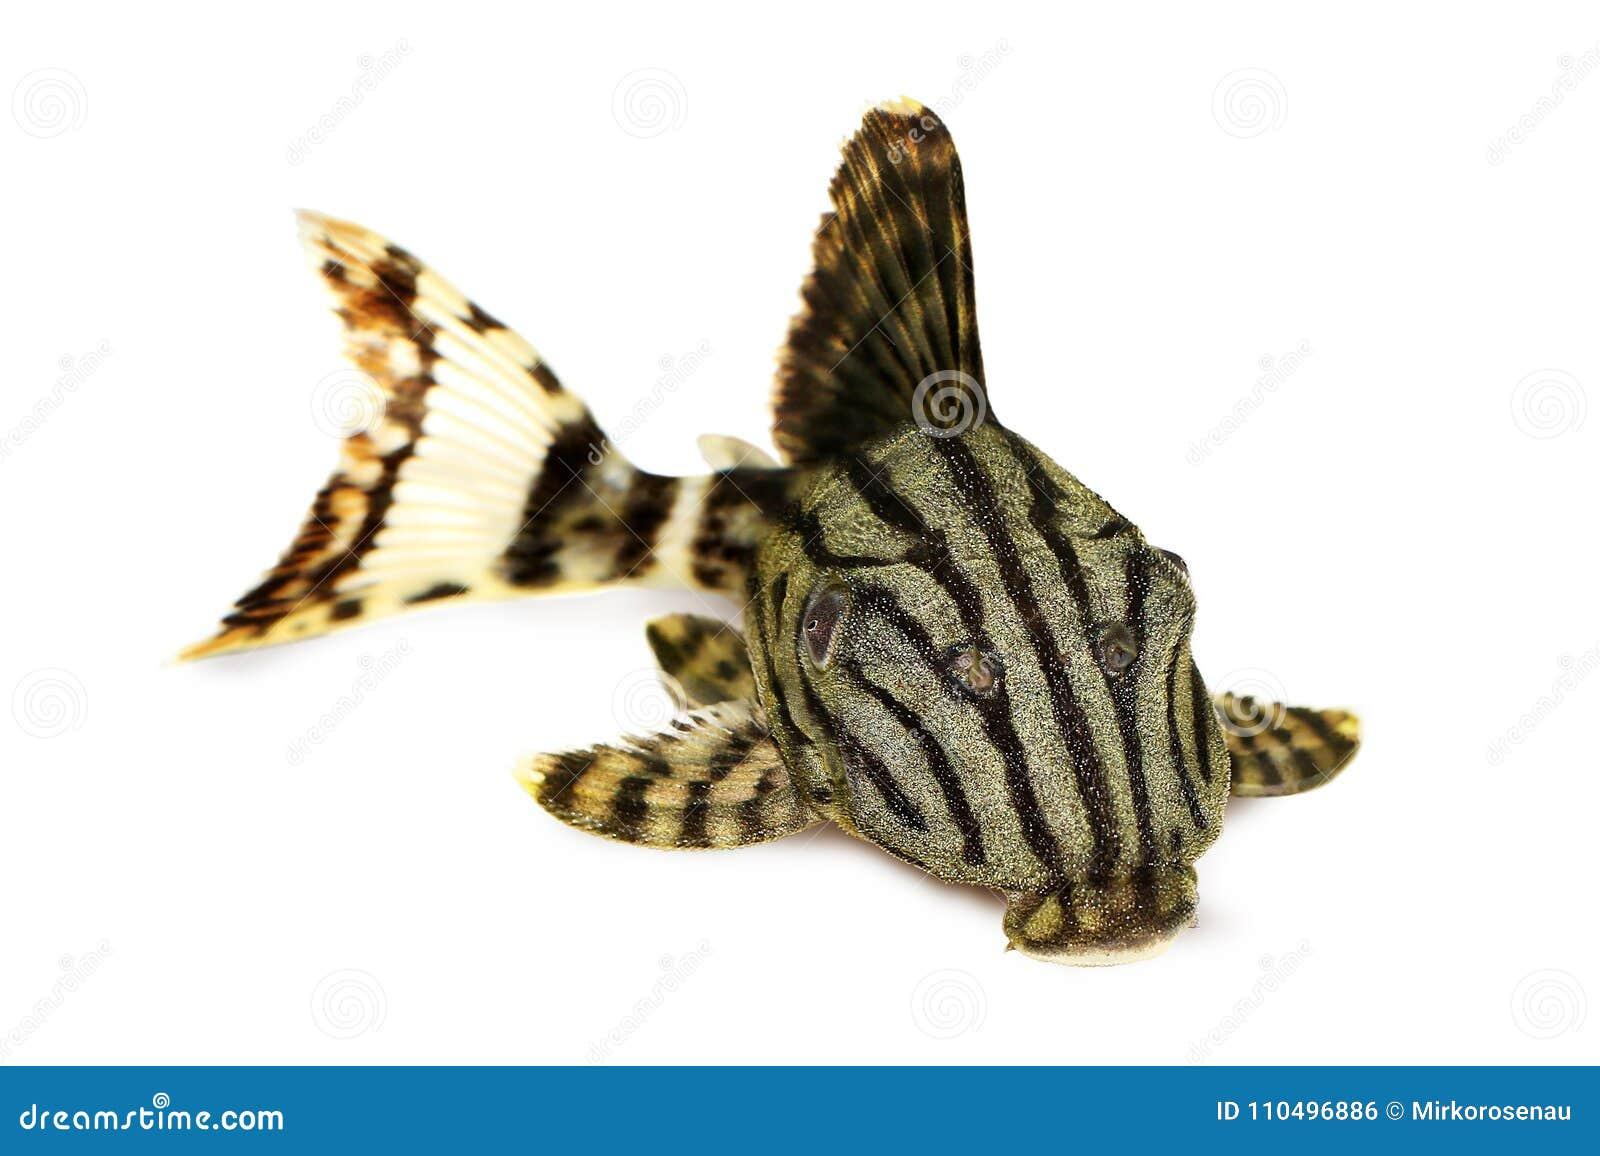 皇家Pleco Panaque nigrolineatus或者皇家plec水族馆鱼